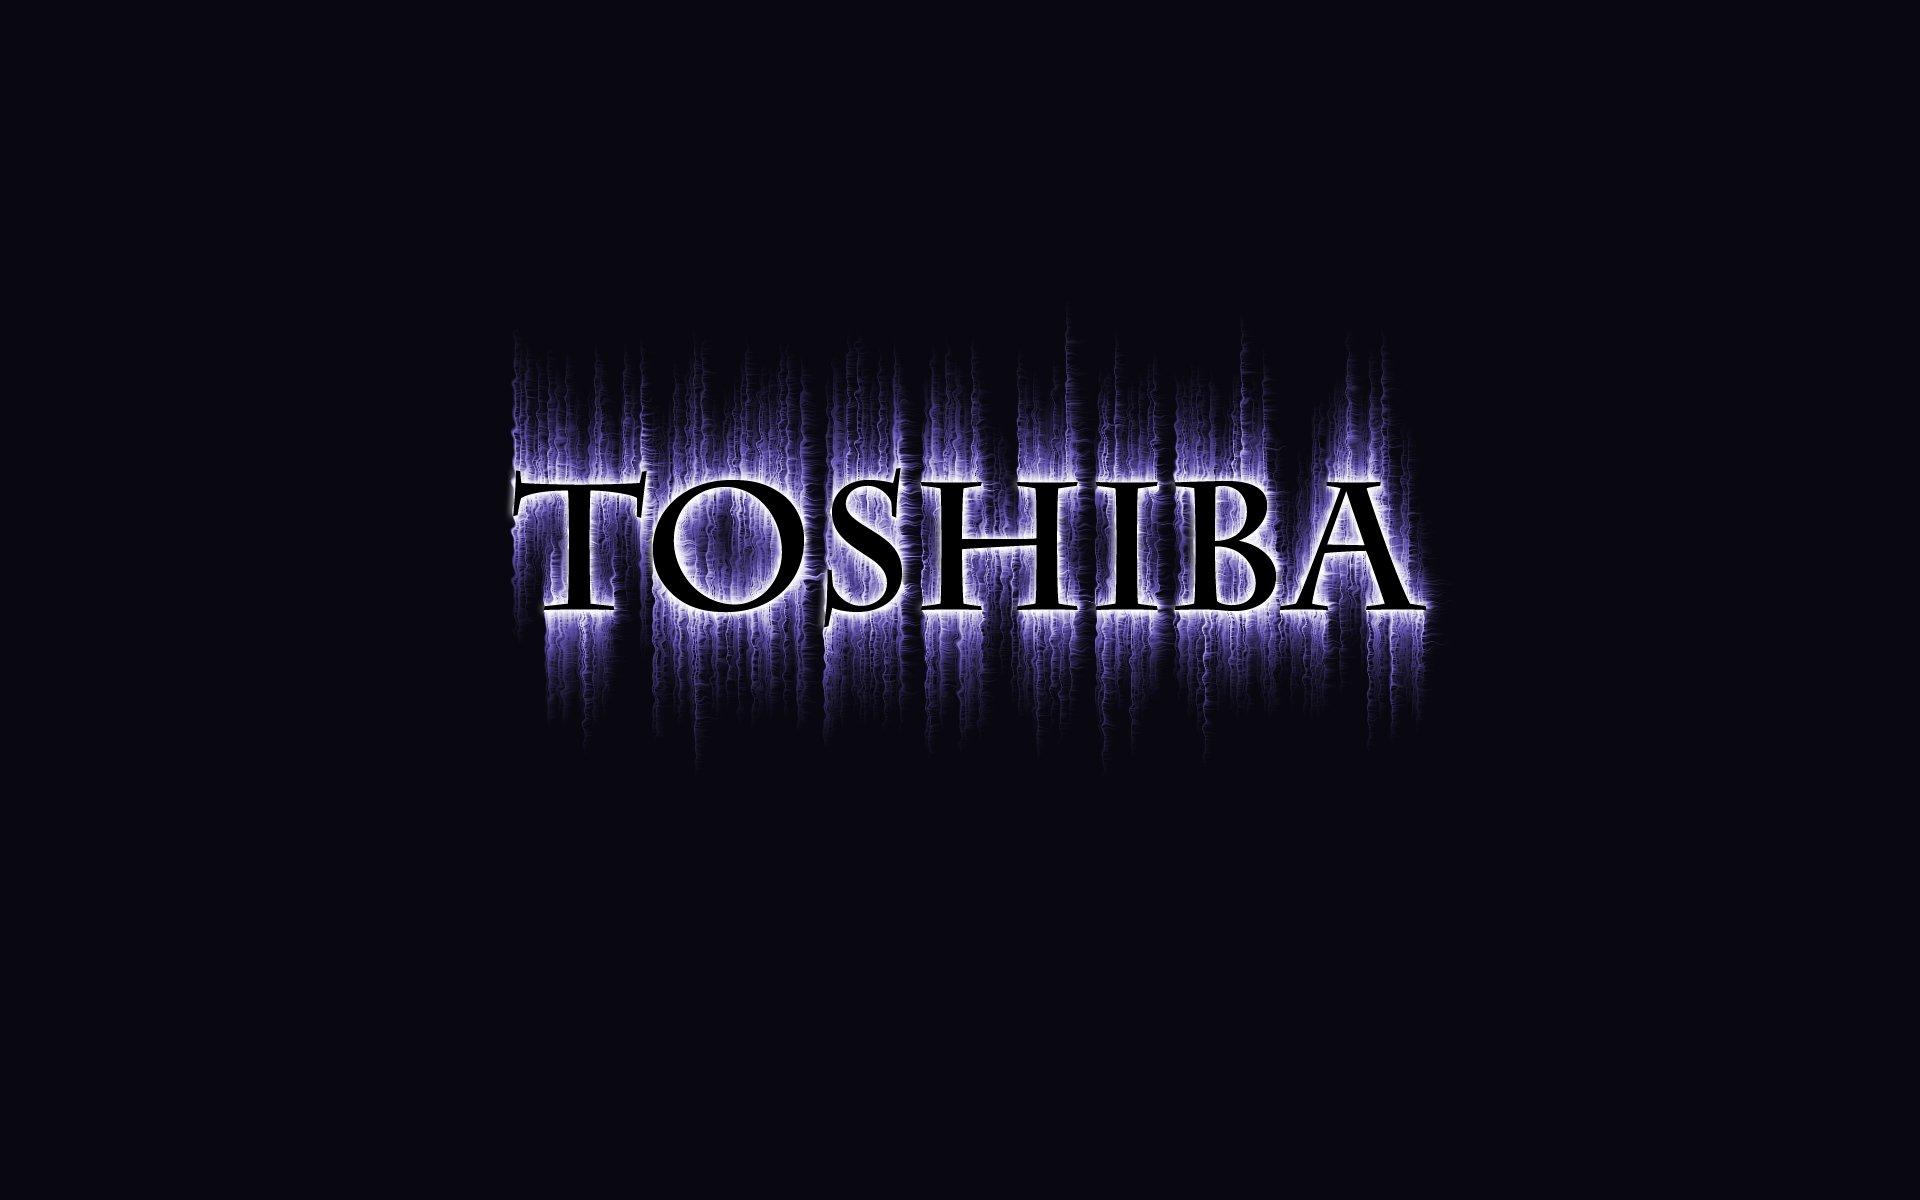 toshiba computer wallpaper 1920x1200 421042 wallpaperup